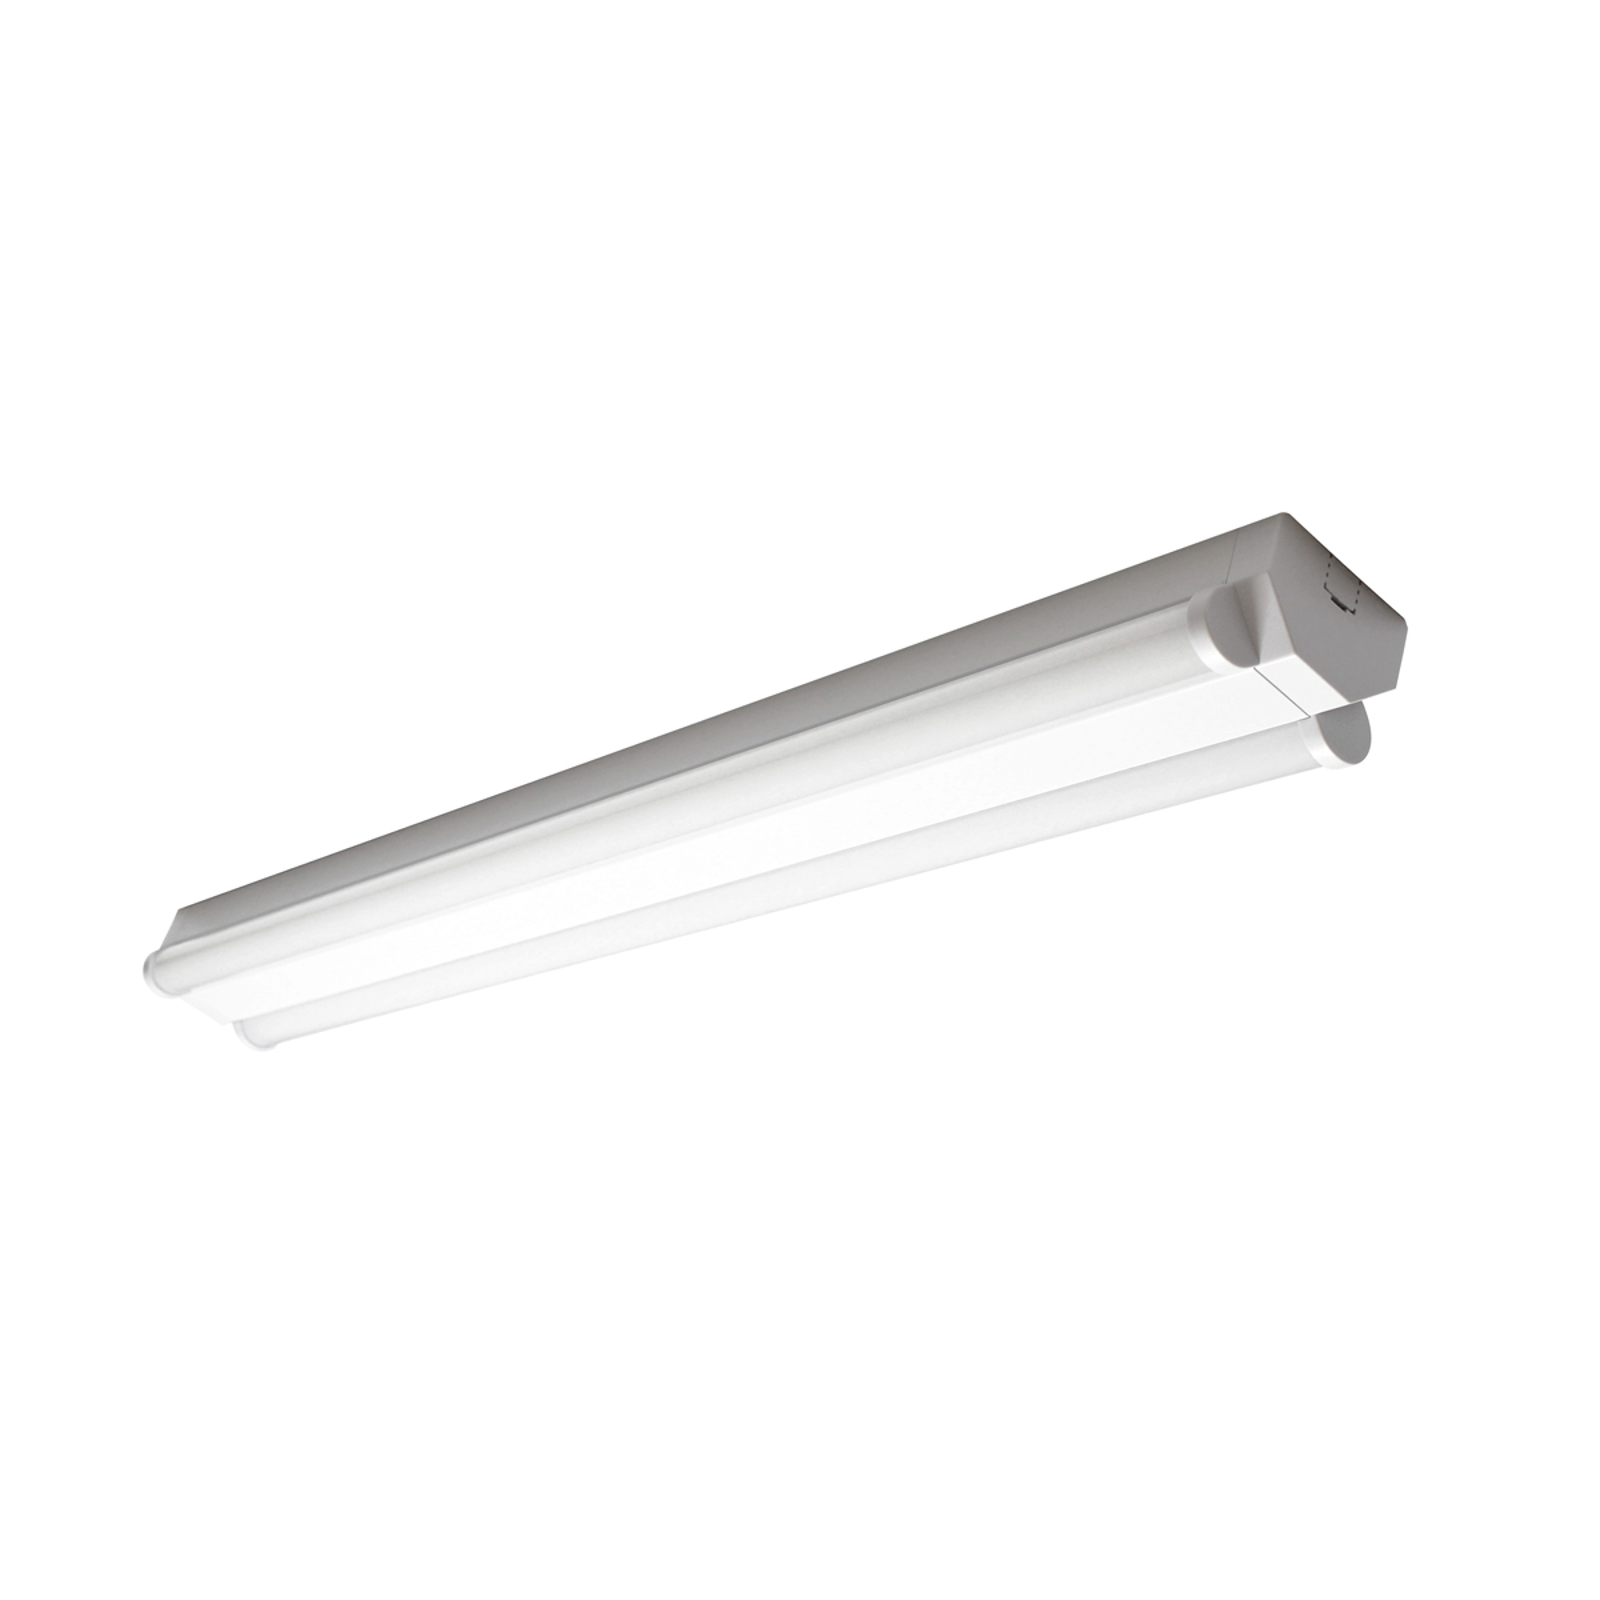 Basic 2 - LED plafondlamp m 2 lichtbronnen - 90cm